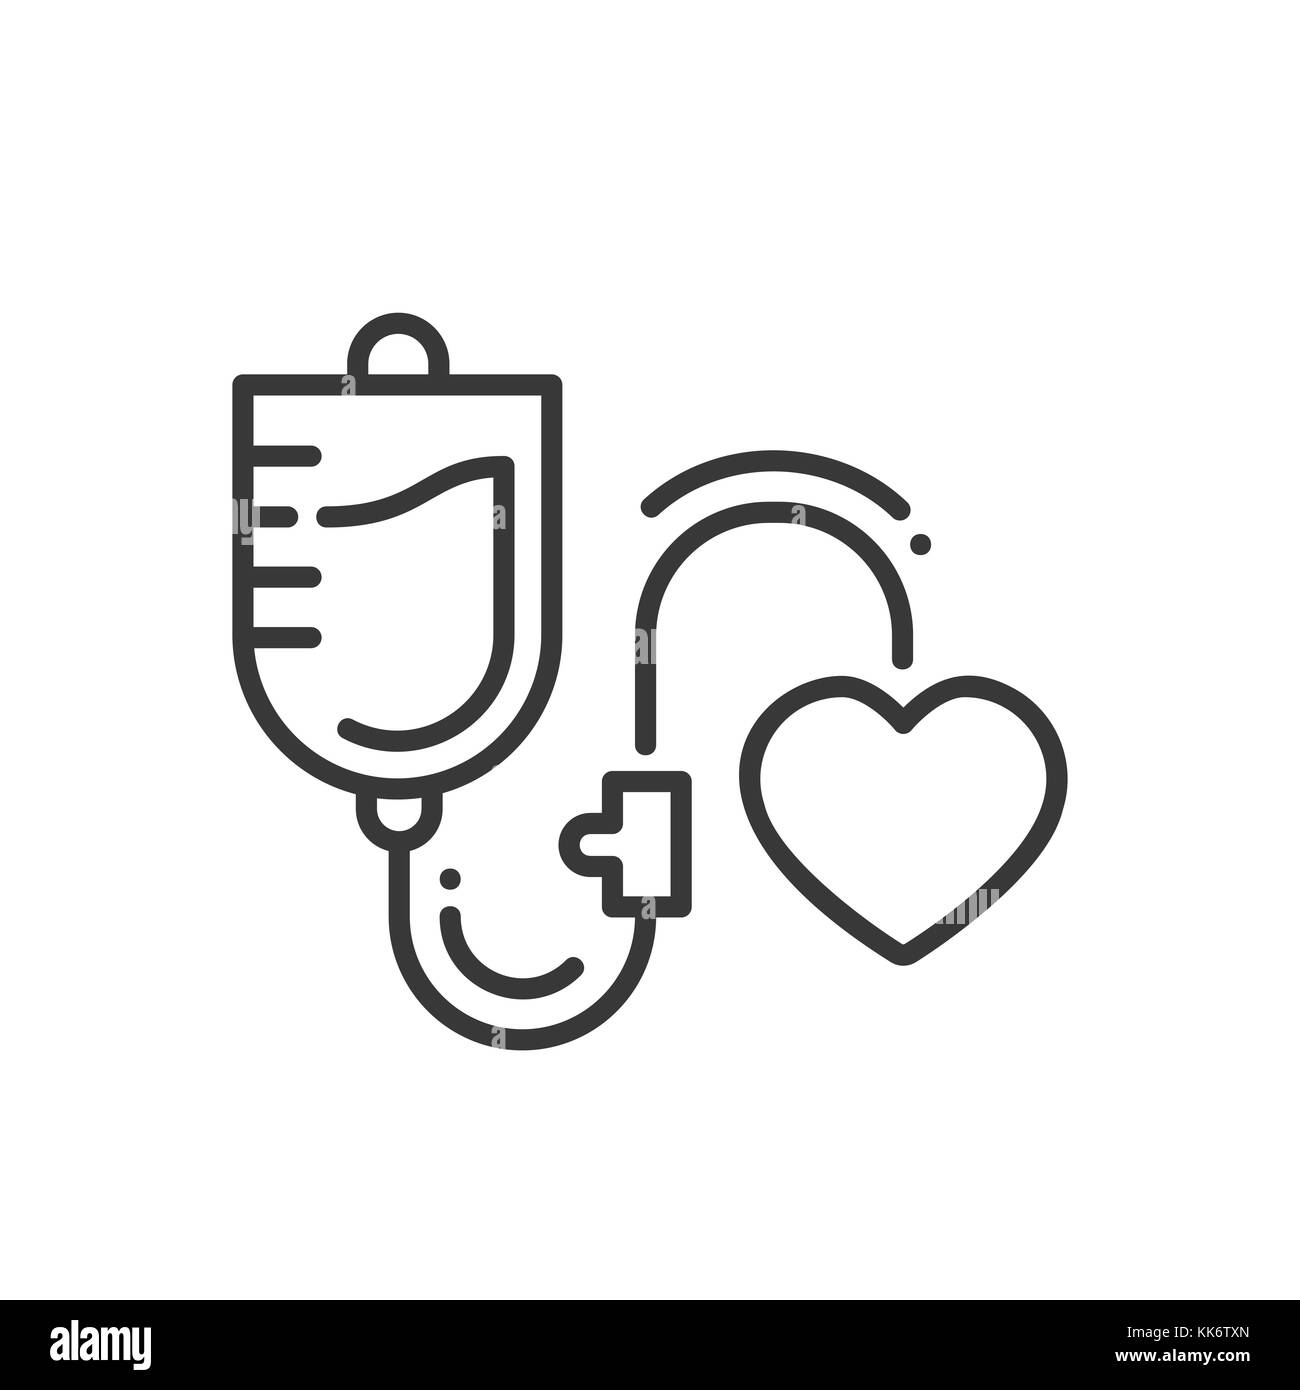 Blood transfusion - line design single isolated icon - Stock Image